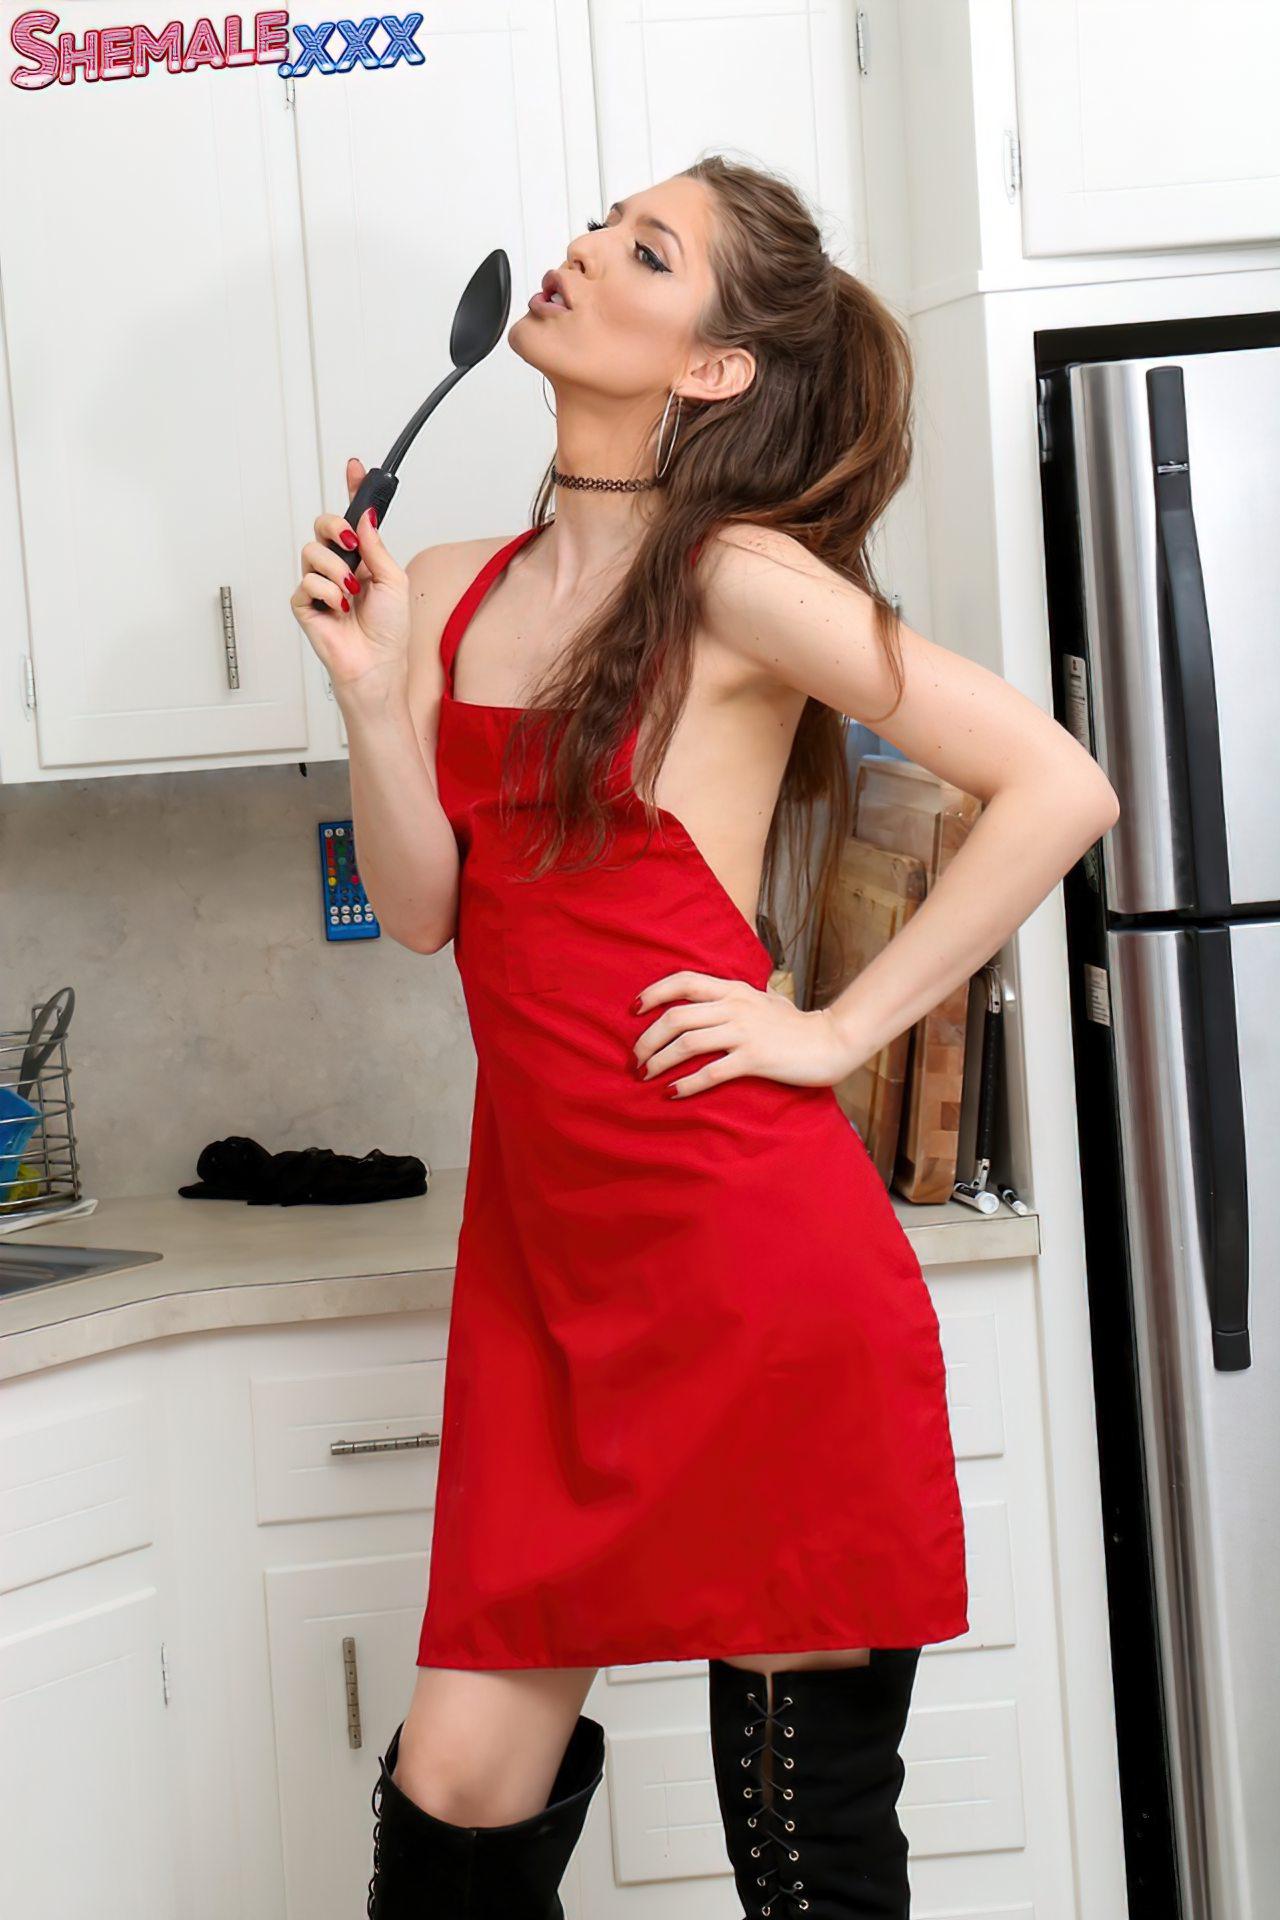 Travesti Sexy Nua Cozinha (3)